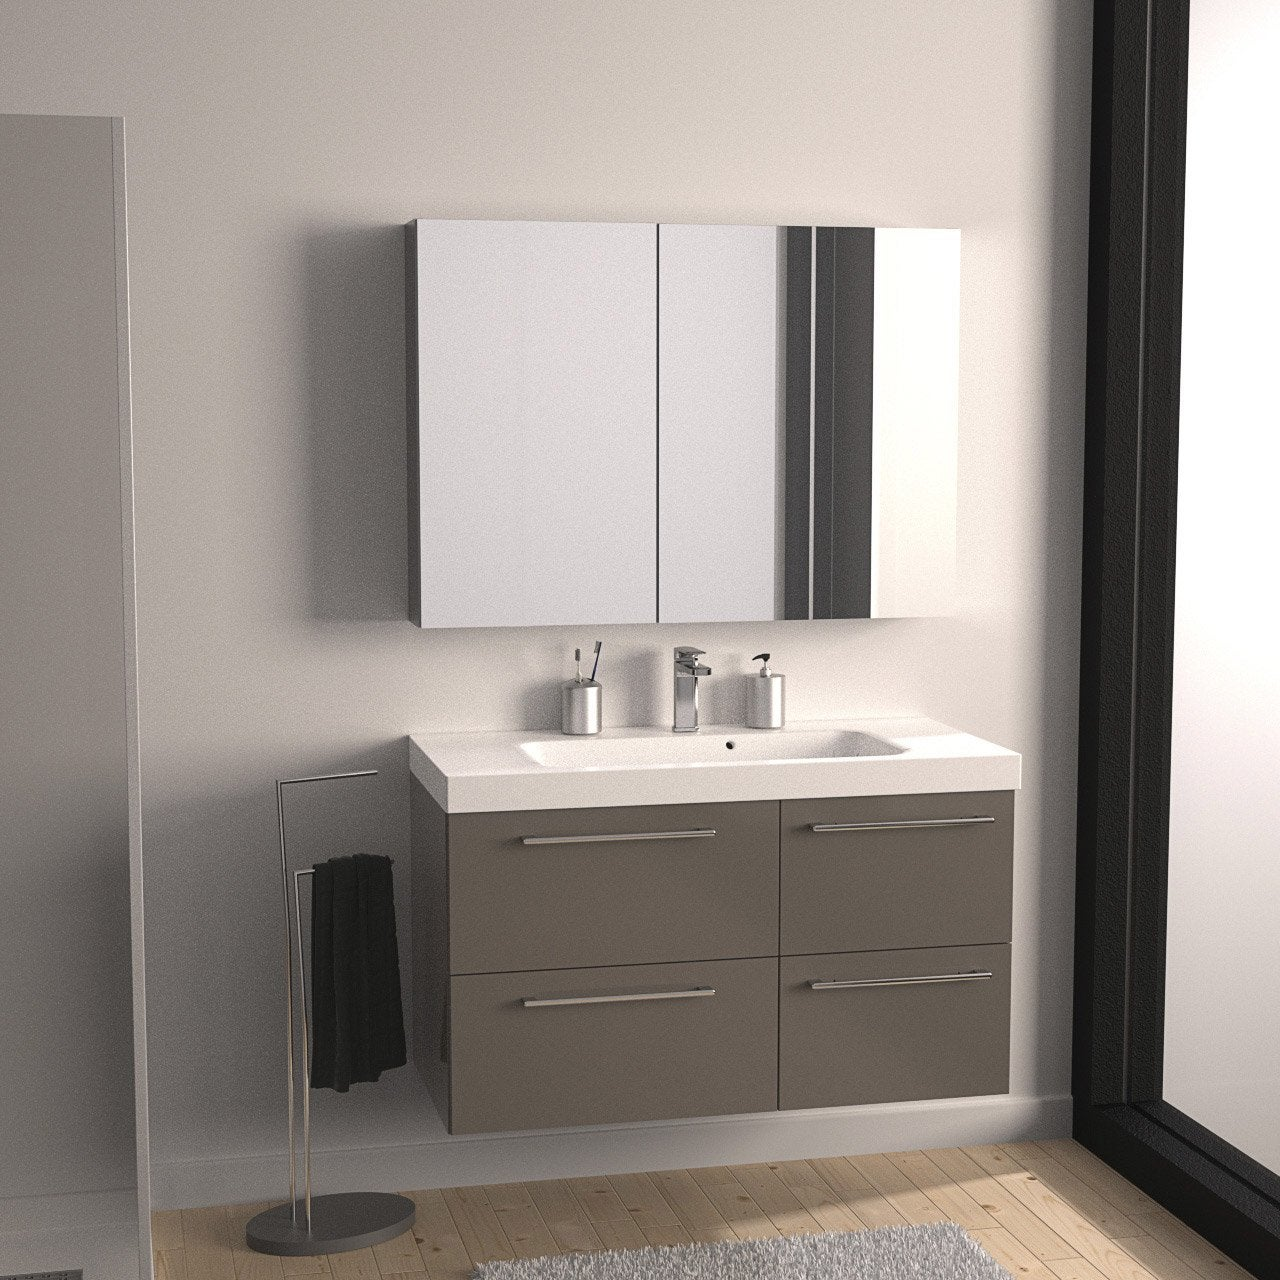 Meuble de salle de bains remix brun taupe n 3 106x48 5 cm for Leroy merlin meuble salle de bain bois